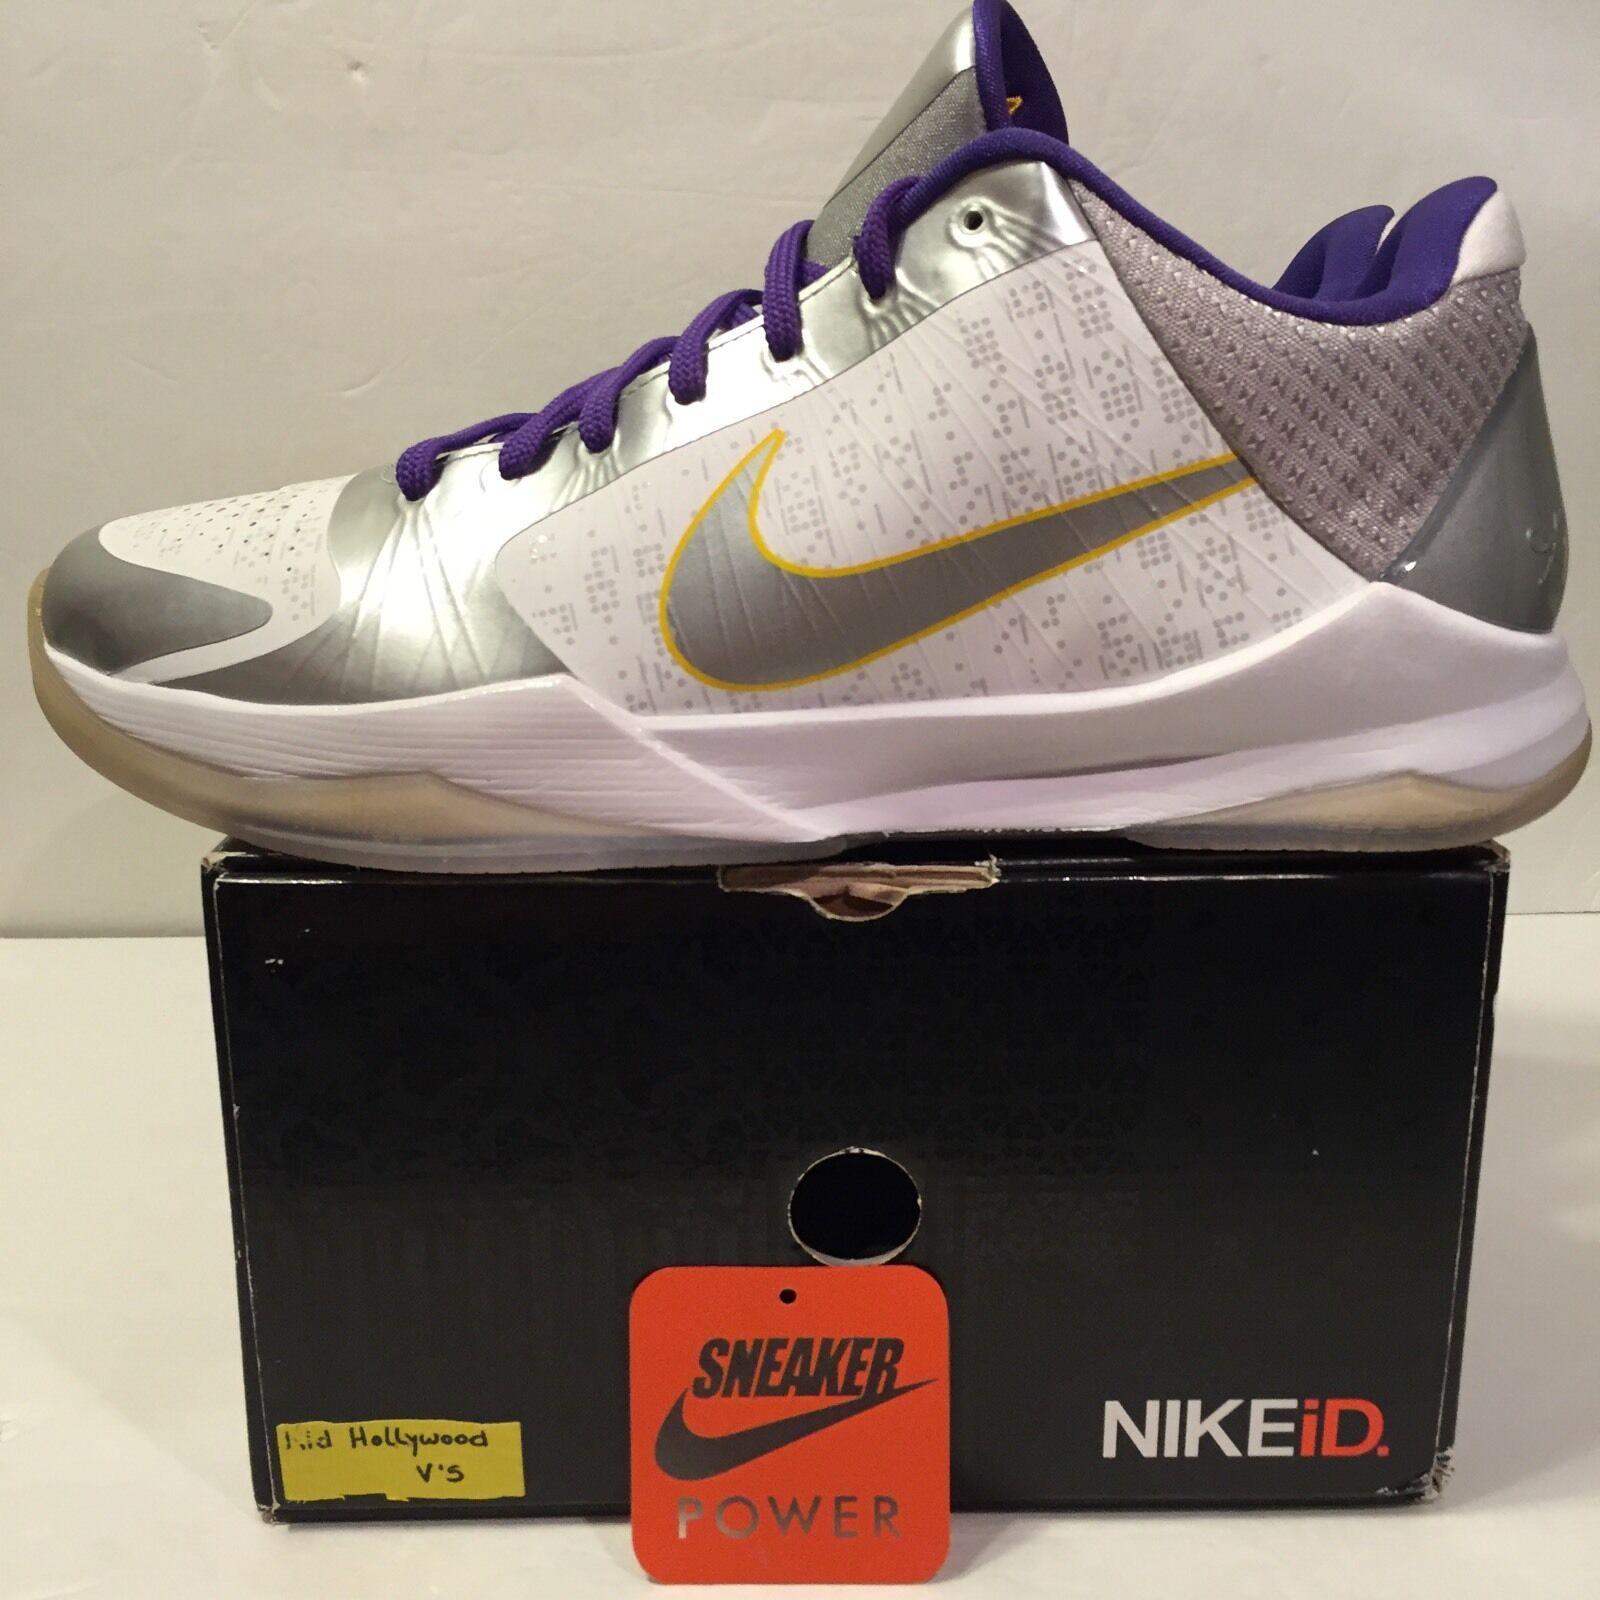 Nike Zoom Kobe Bryant V 5 Sz 12 Kid Kid Kid Hollywood ID White Purple Black 81 IV I Vi X 7a8adc